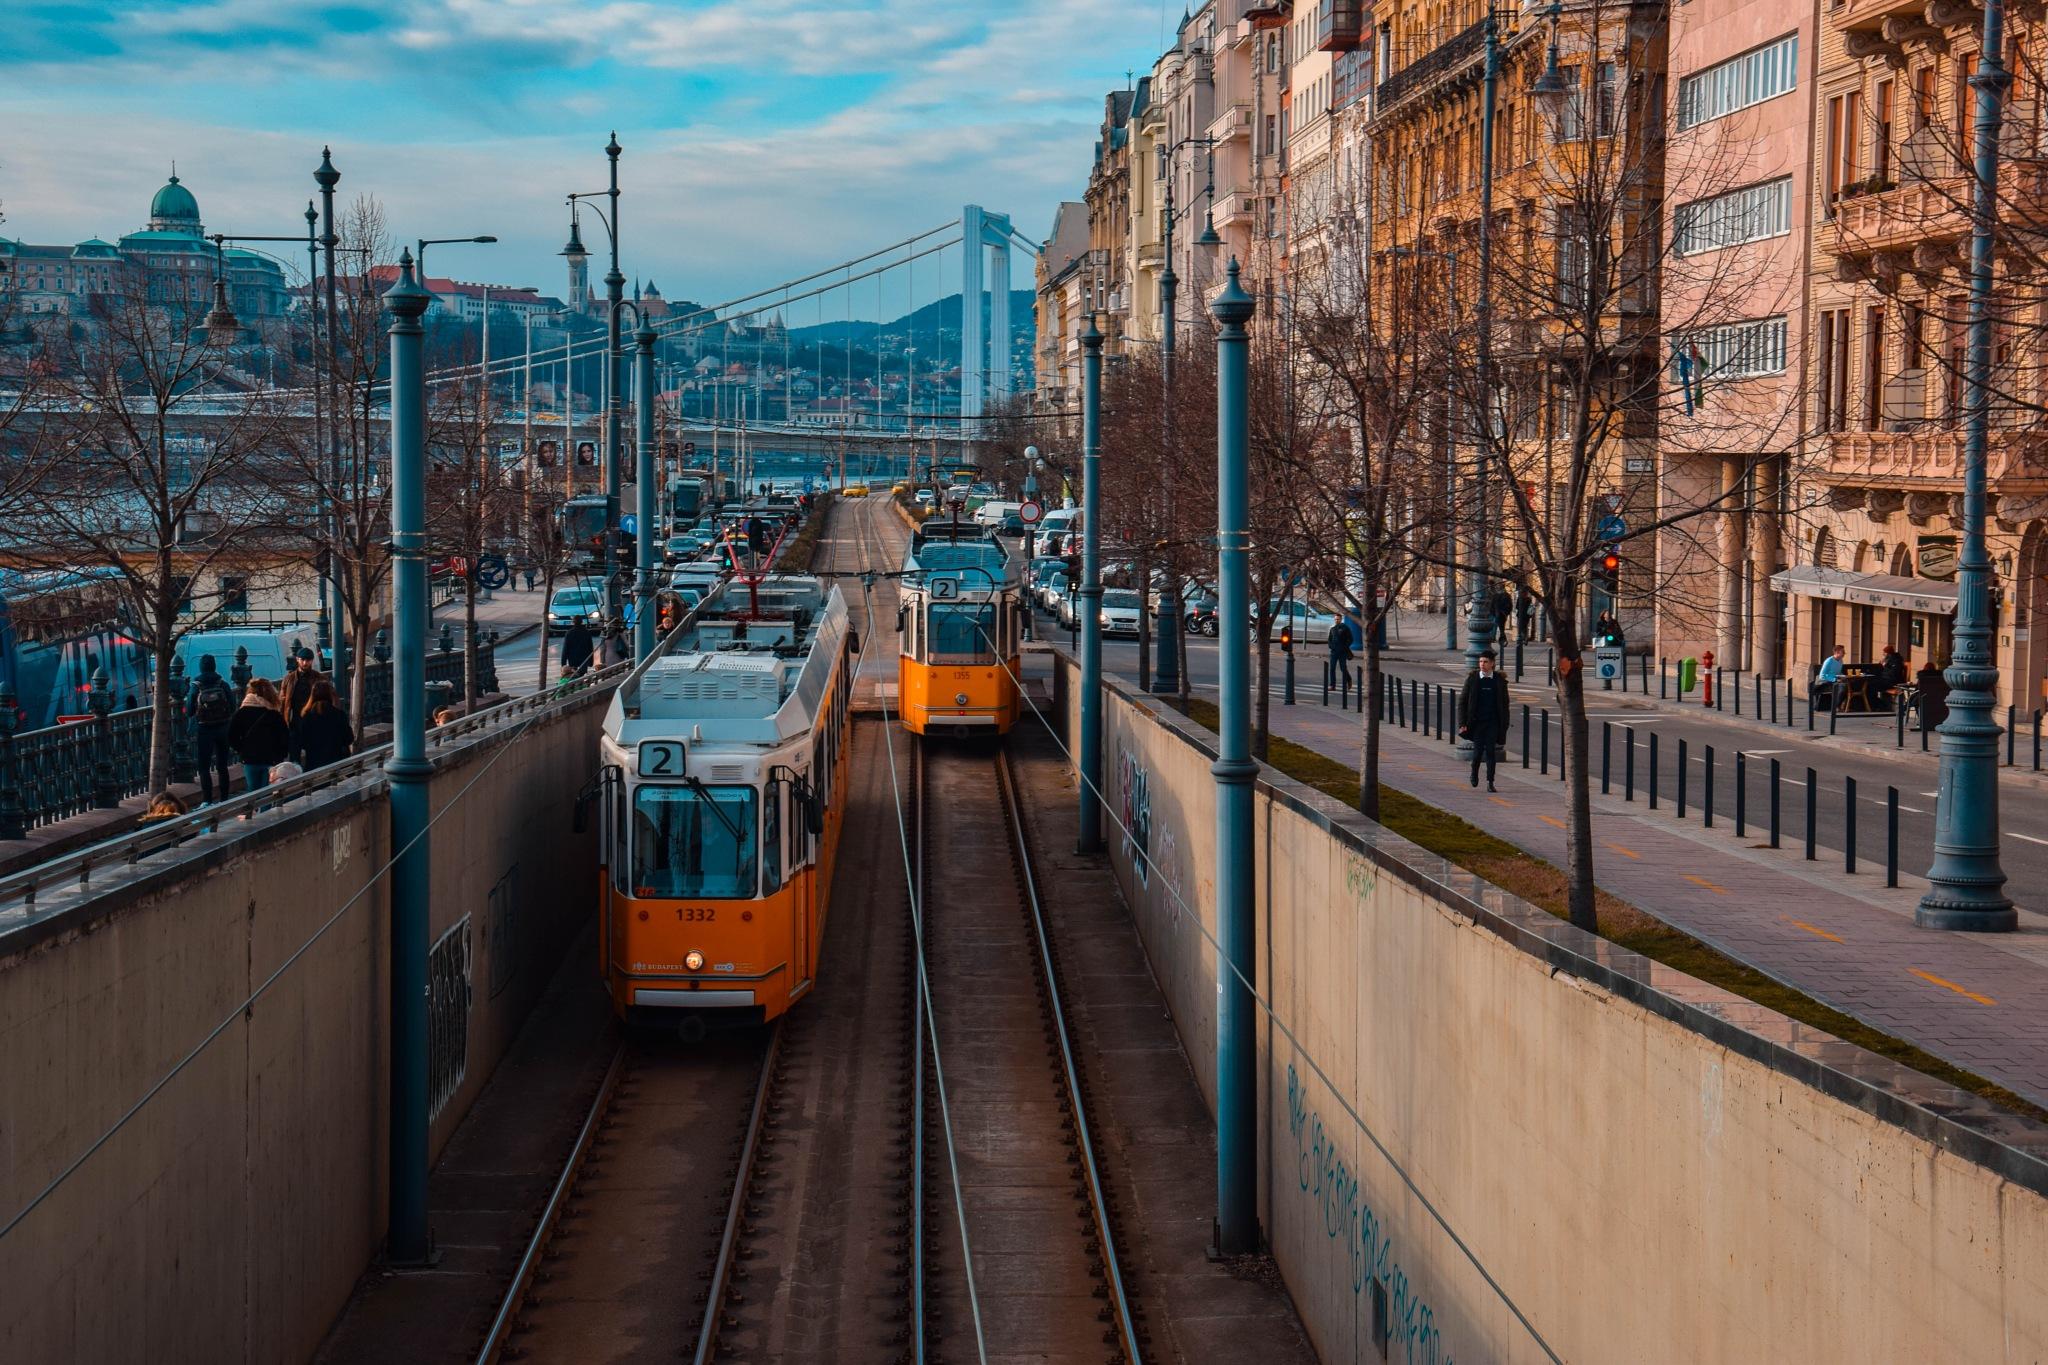 Trams by Nagy-Szabó Viktória